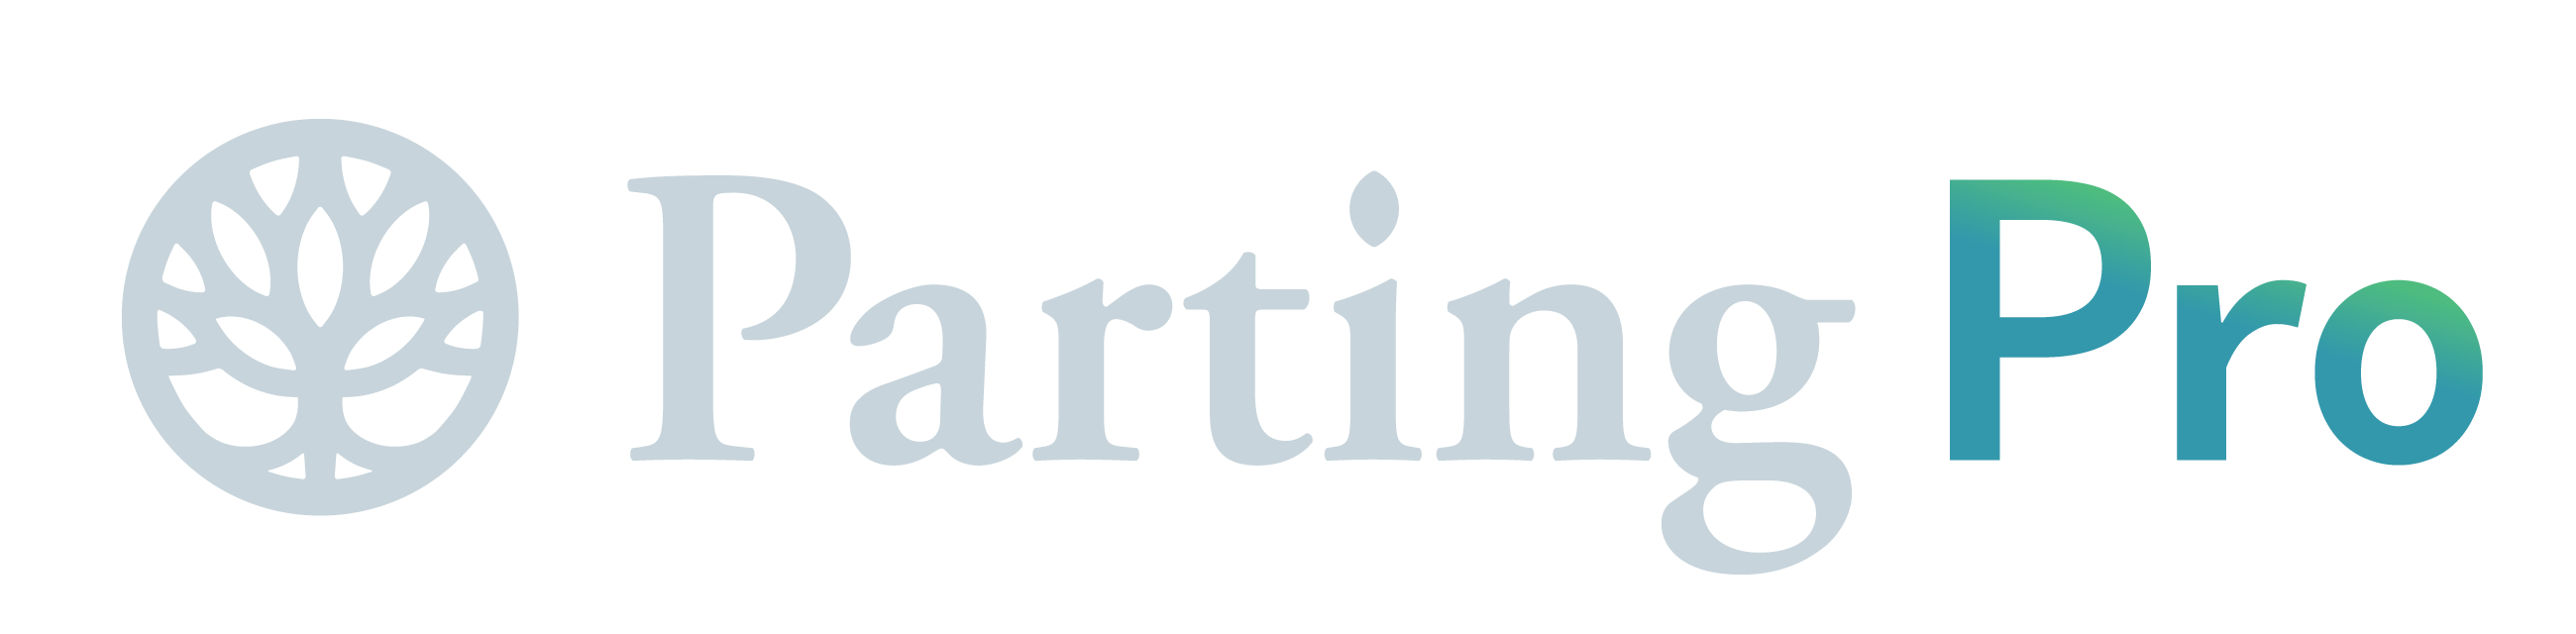 PartingPro-logo-reversed.png